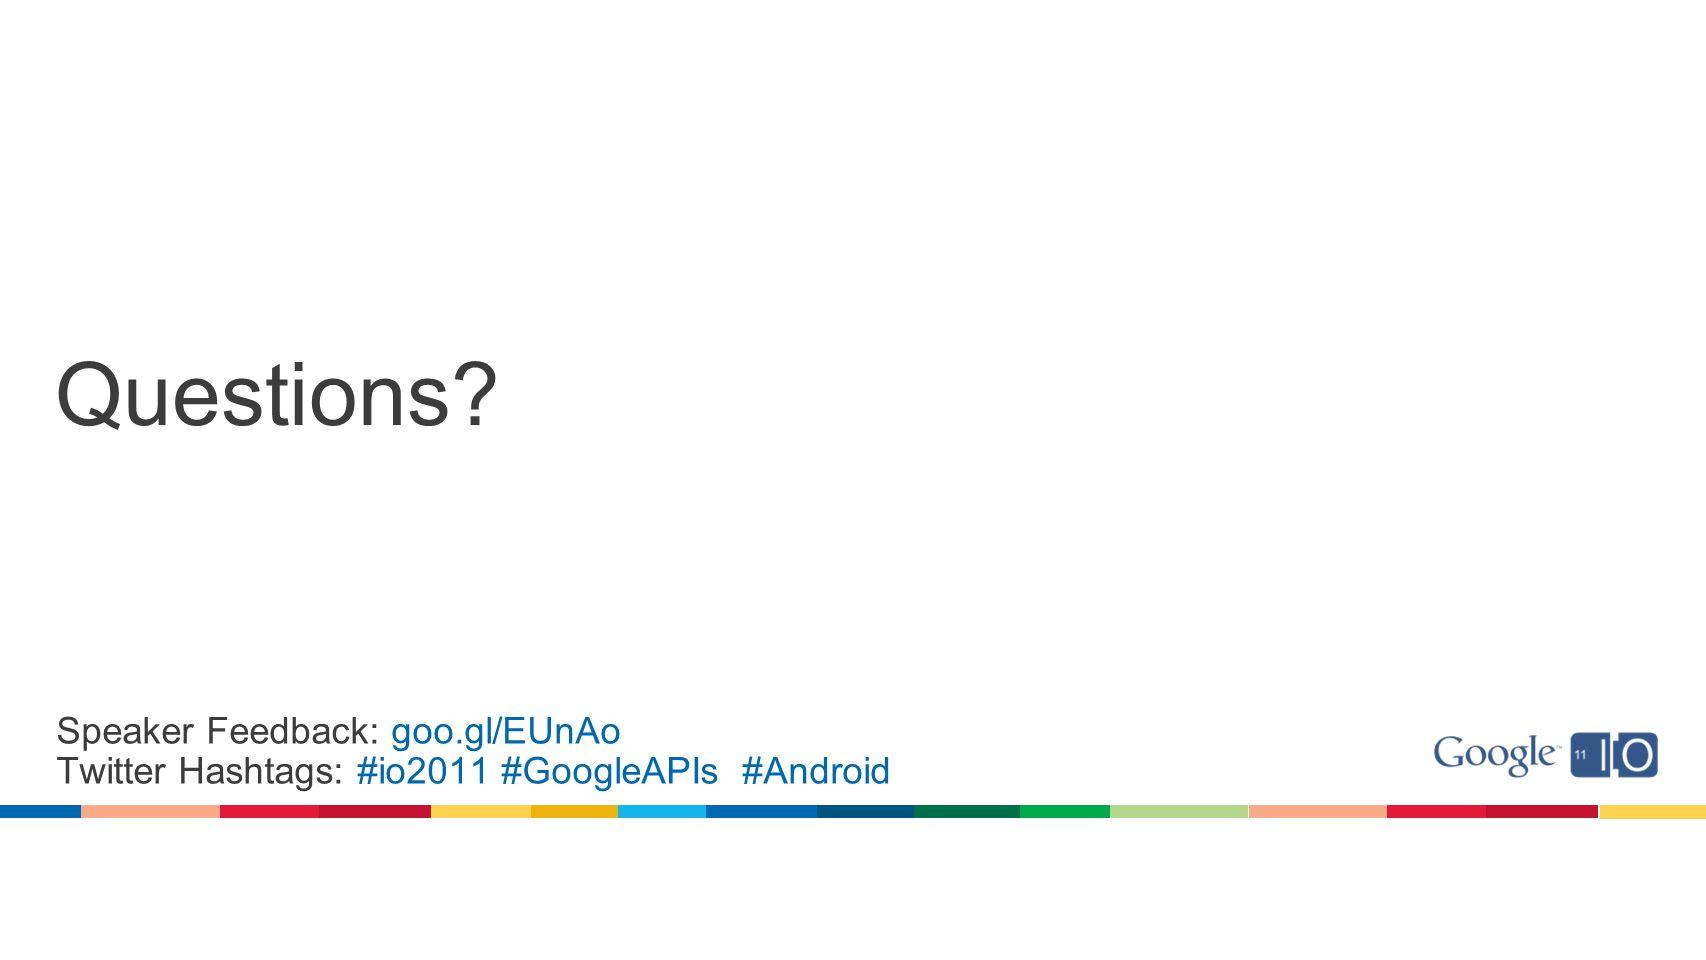 Questions? Speaker Feedback: goo.gl/EUnAo Twitter Hashtags: #io2011 #GoogleAPIs #Android